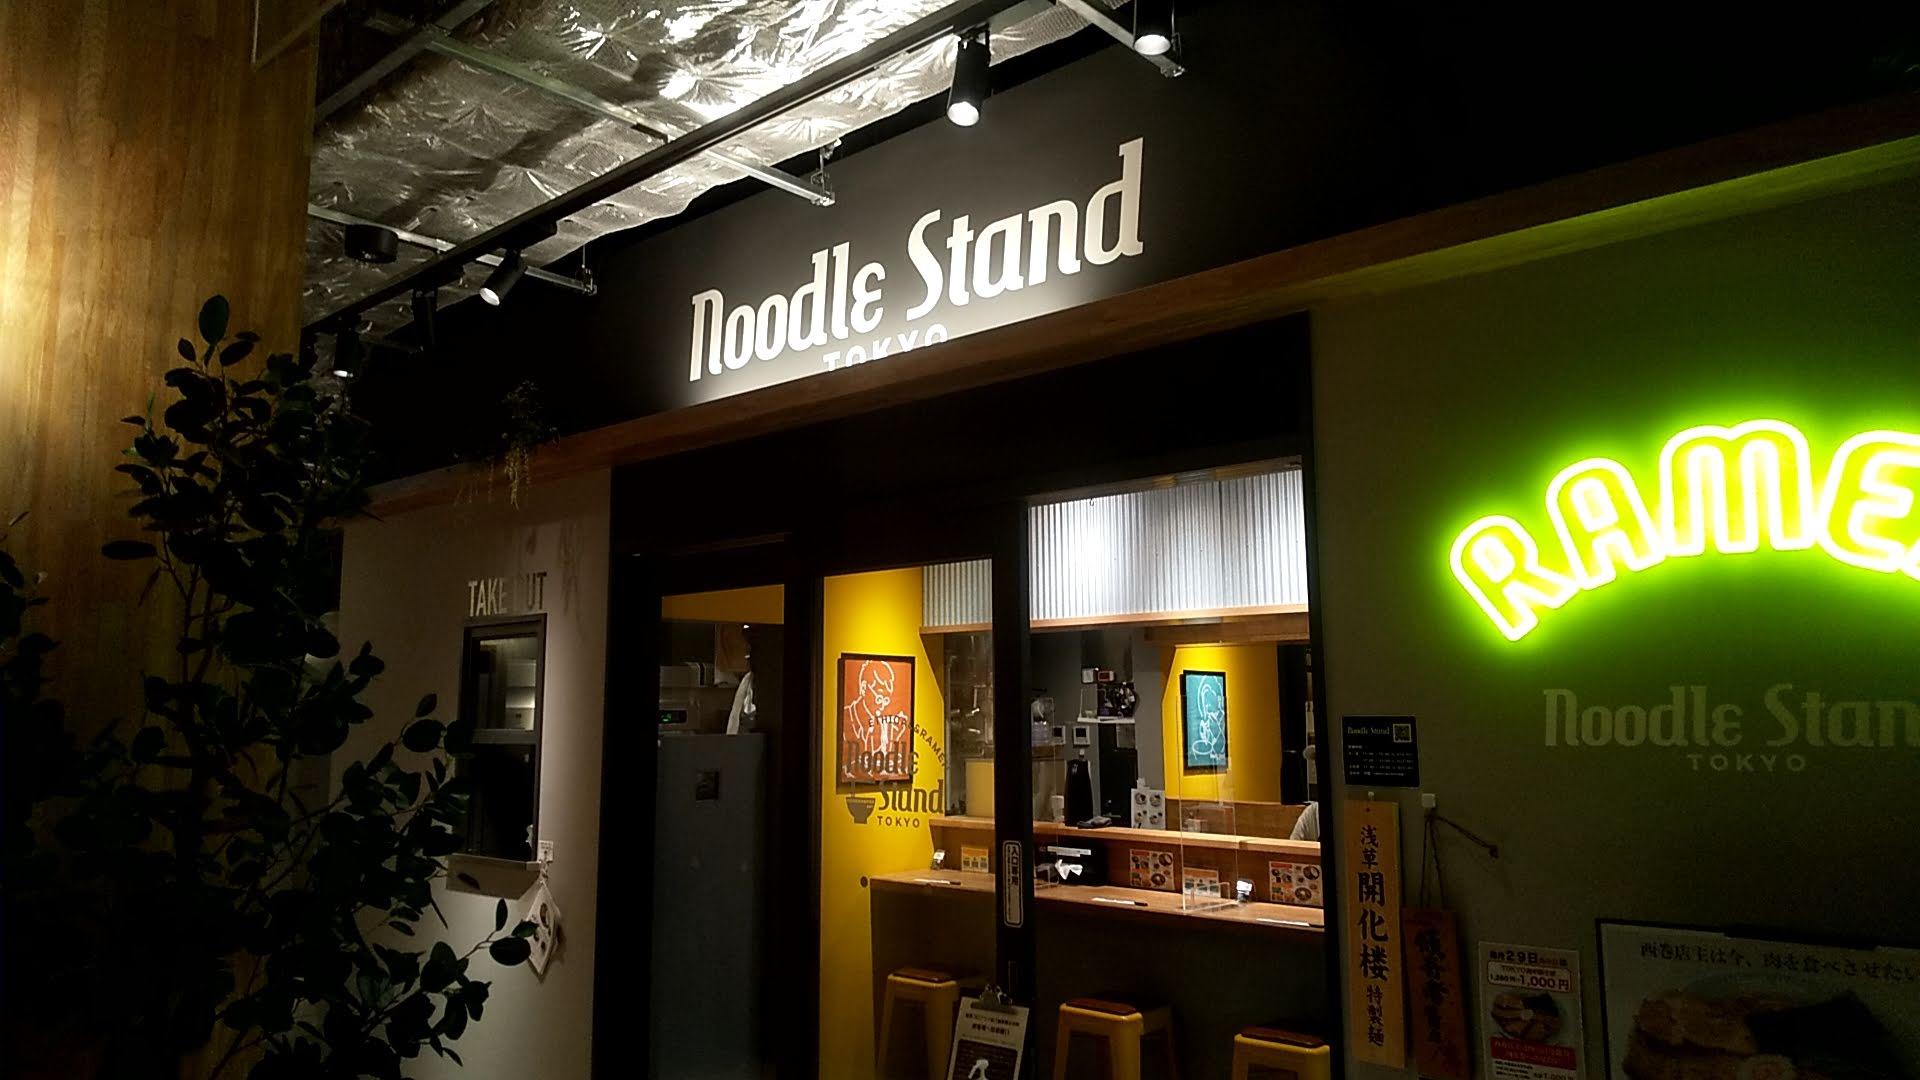 NoodleStandTokyoの外観写真